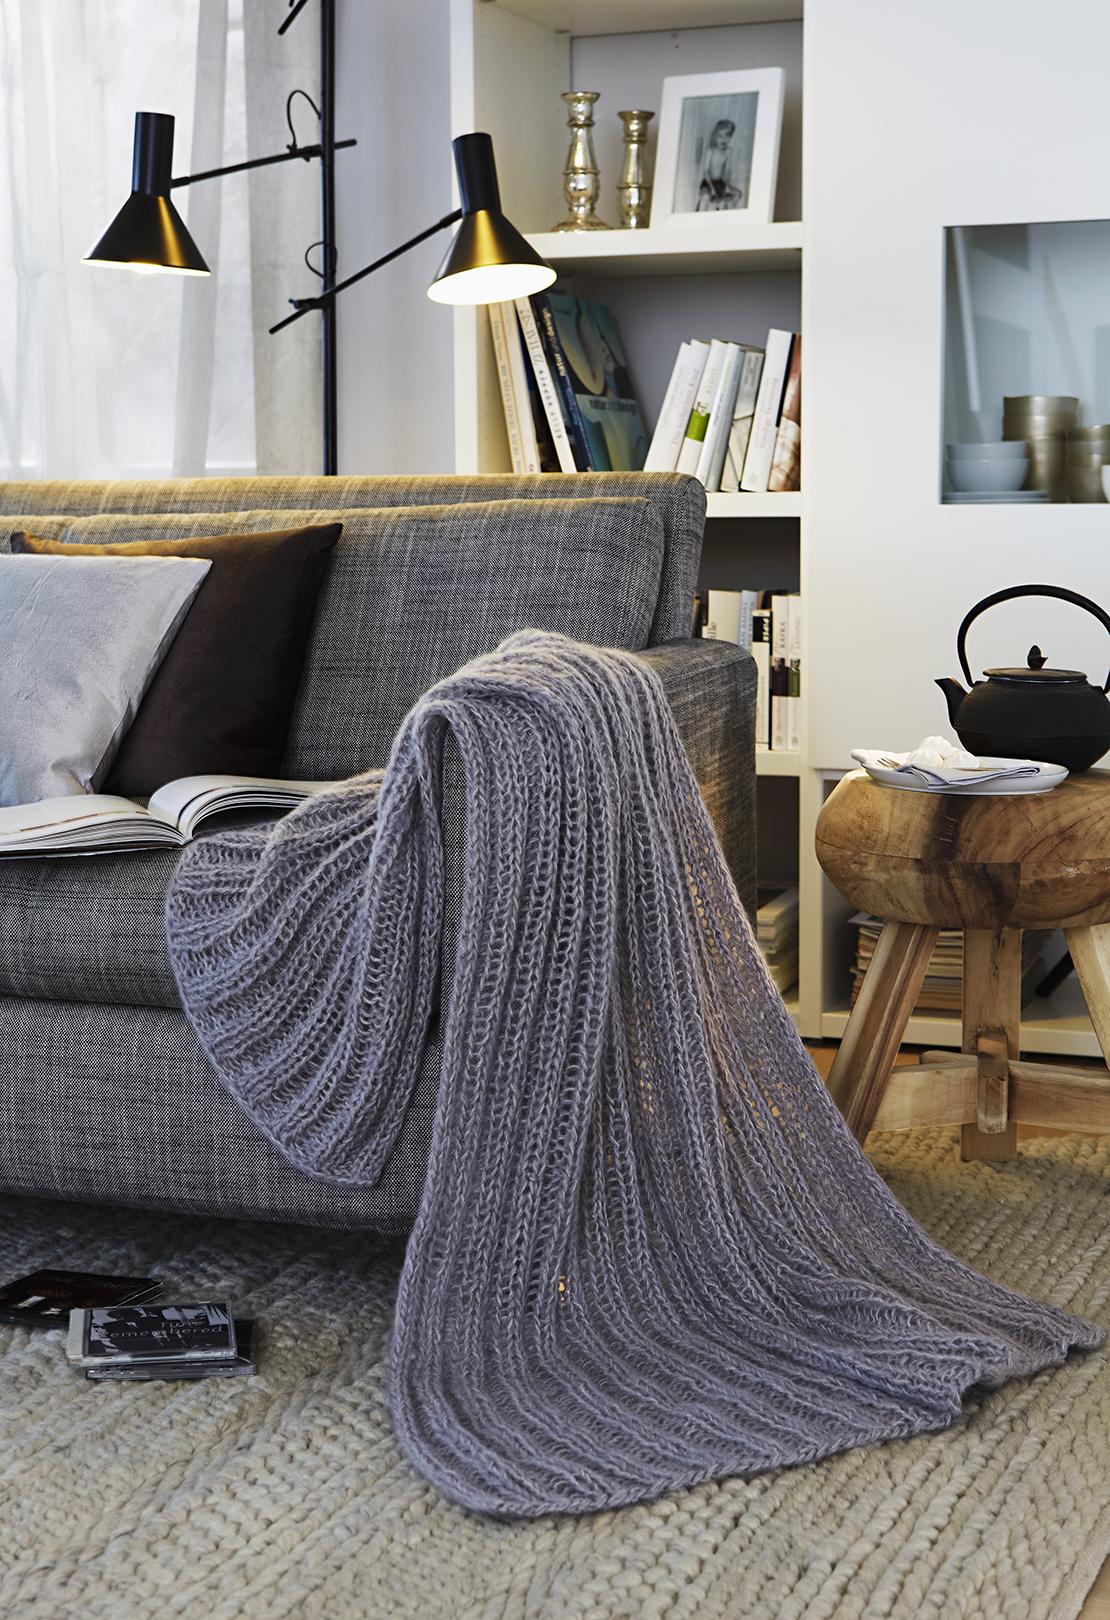 decoración con encanto- tonos grises